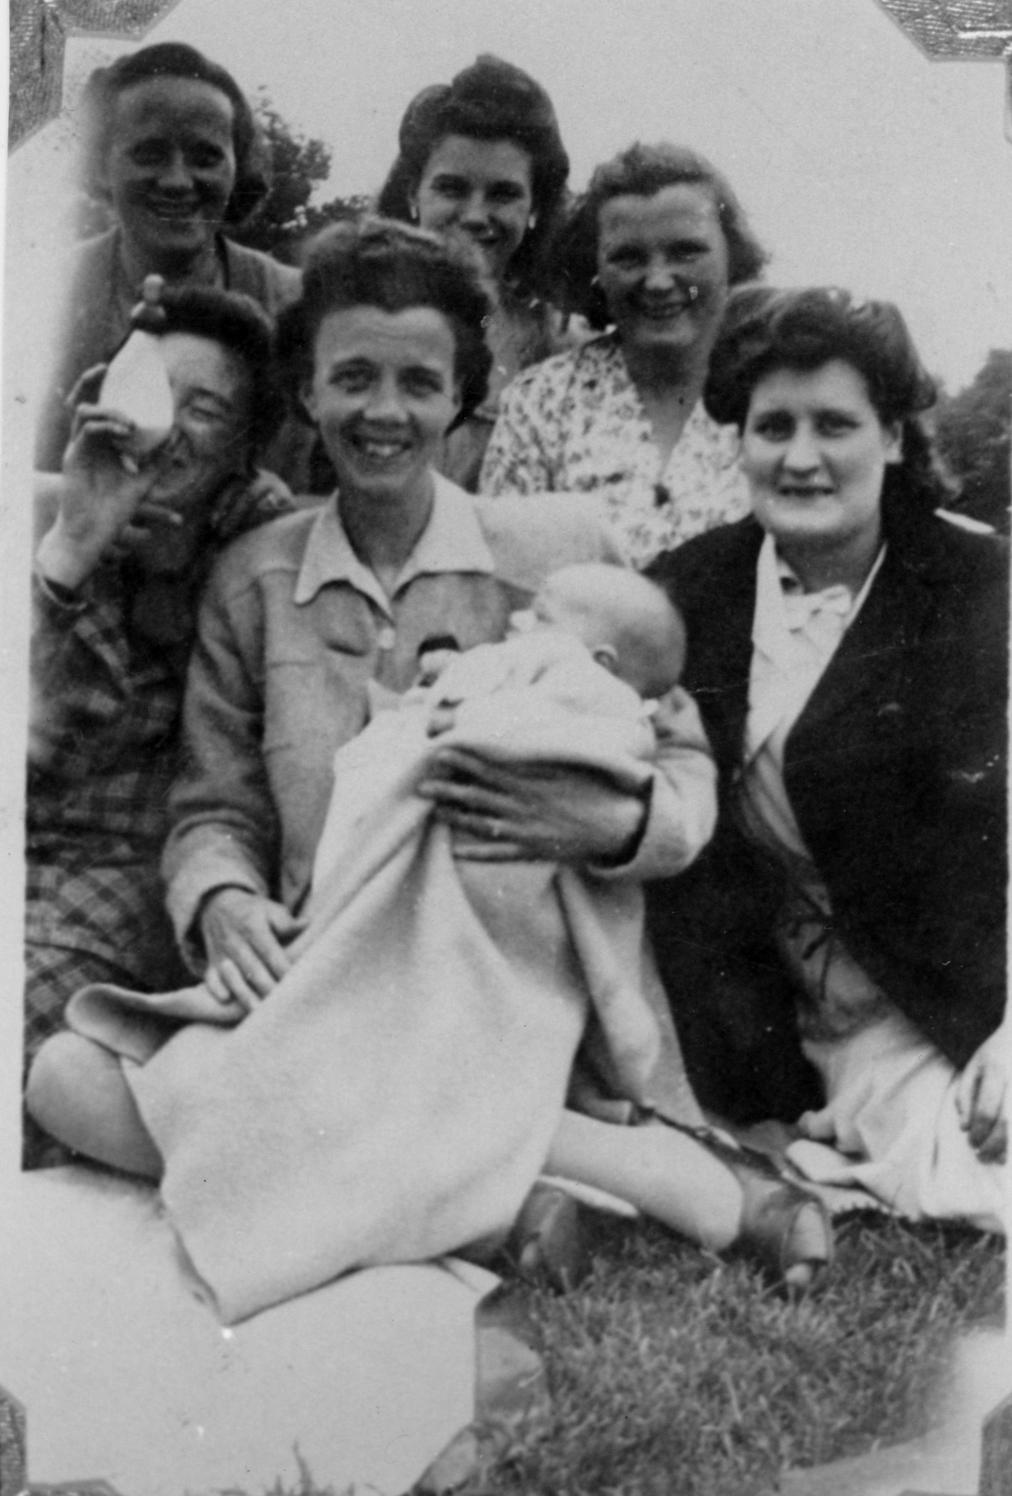 Roseburn Nursery School Picnic, July 1947